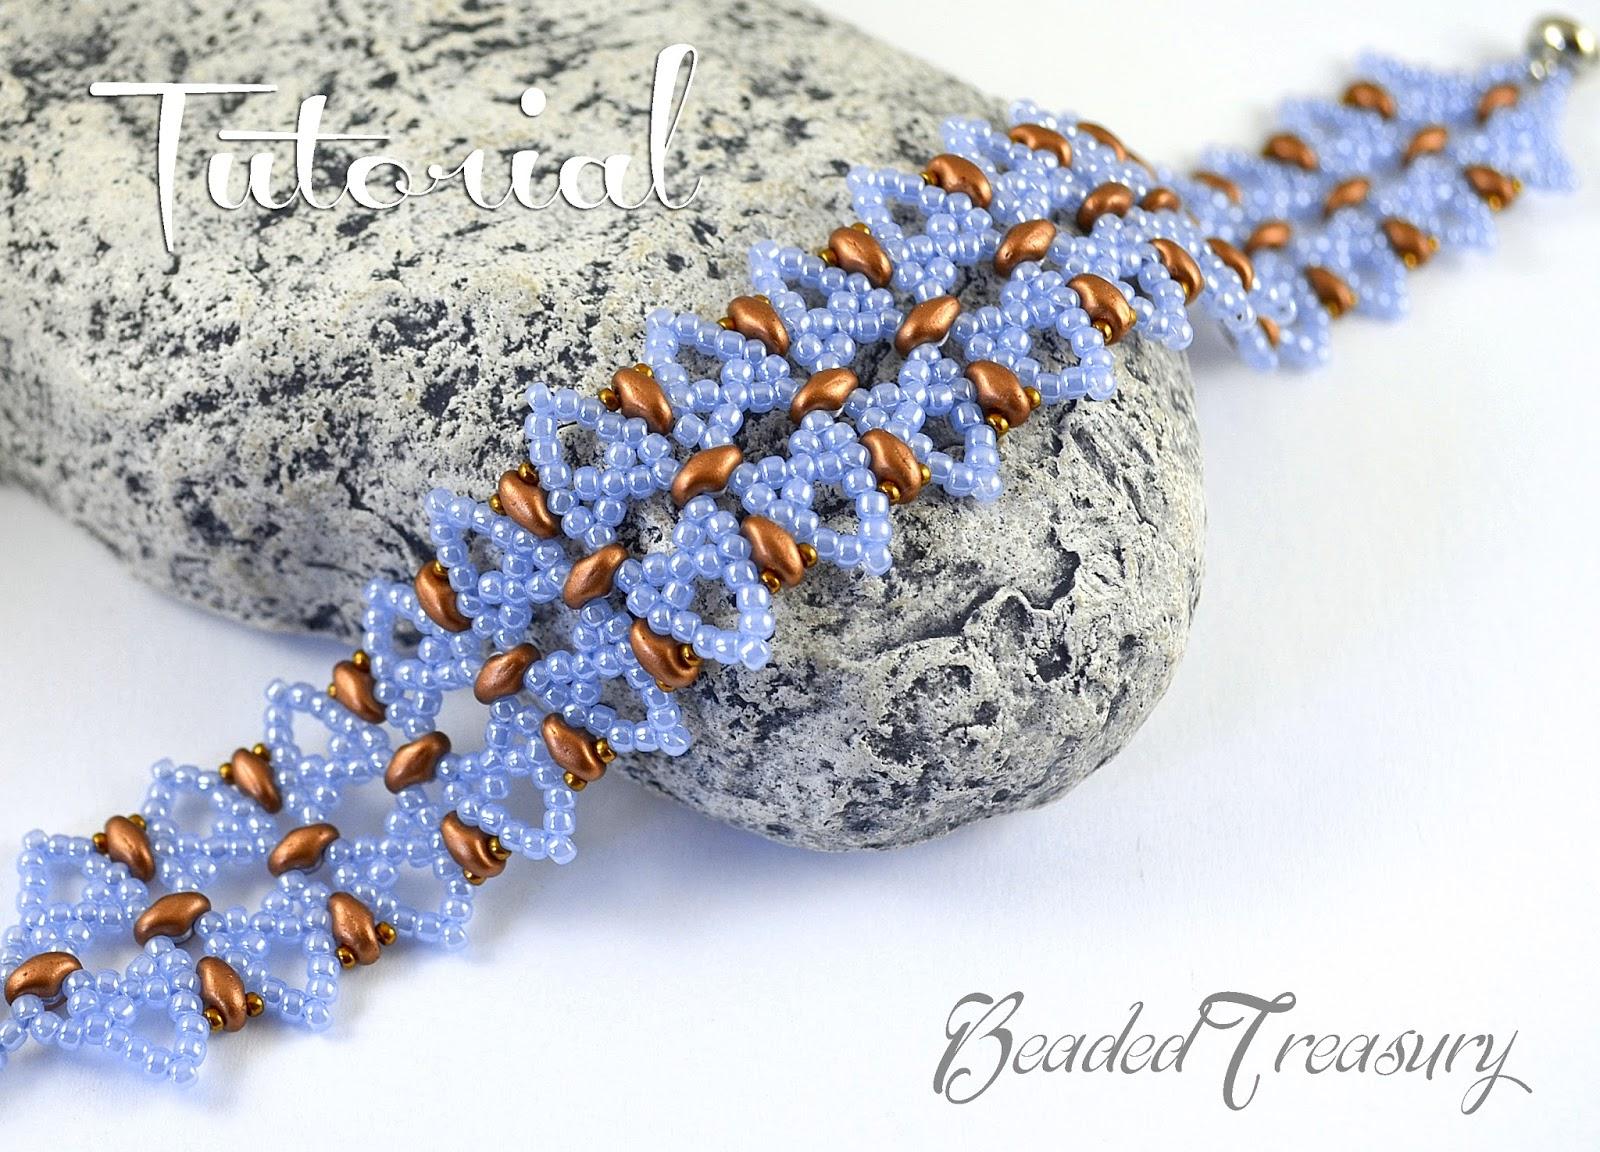 beads venice - photo#40